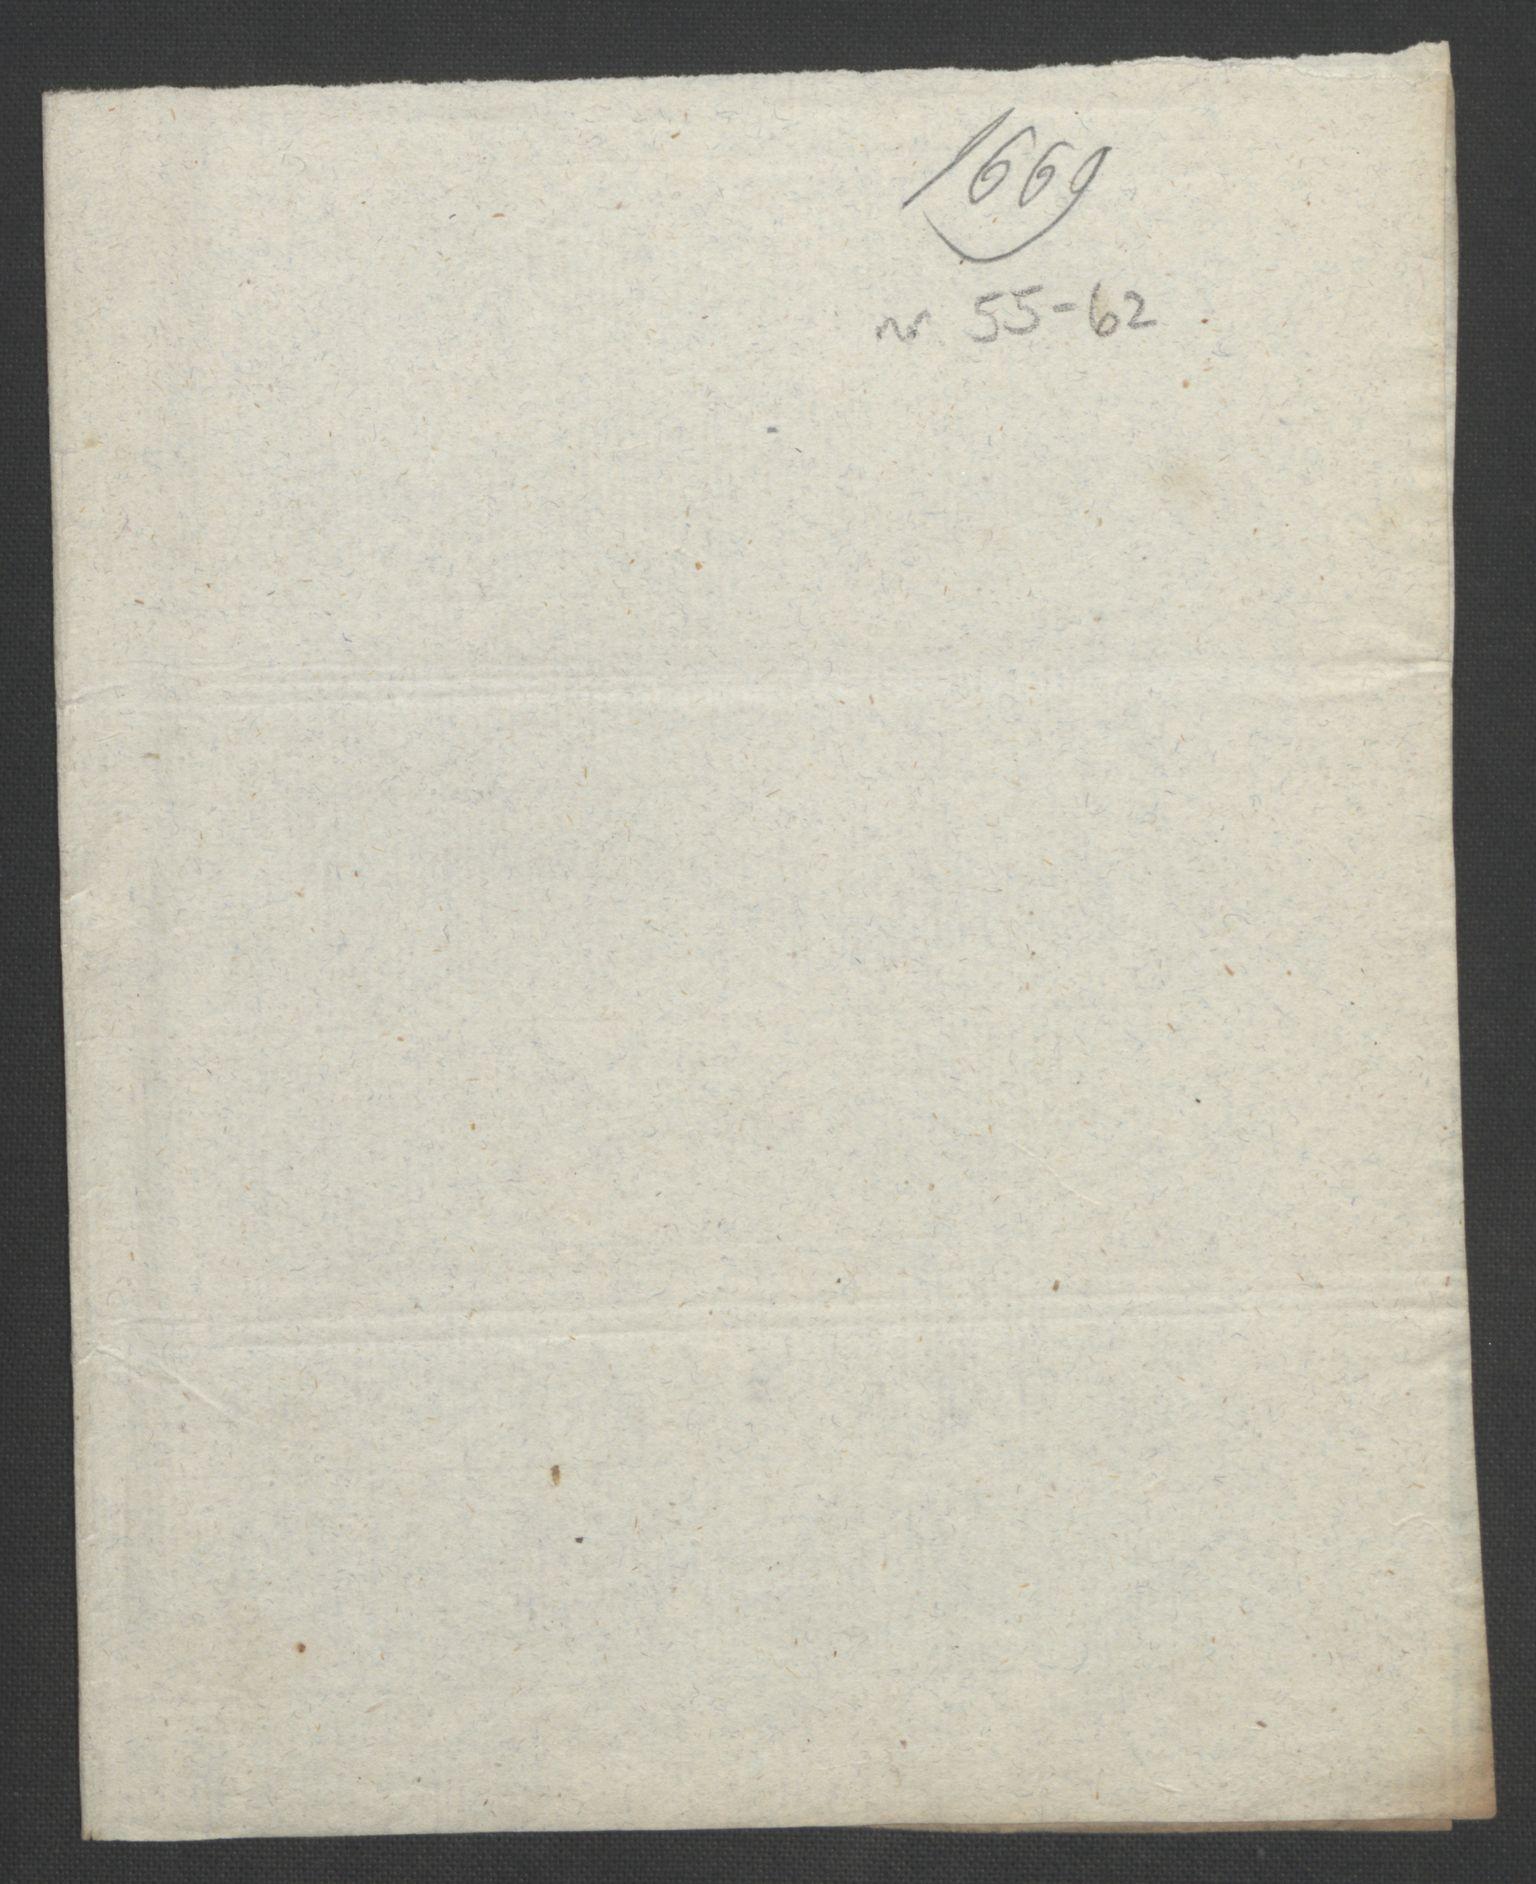 RA, Rentekammeret inntil 1814, Reviderte regnskaper, Fogderegnskap, R32/L1842: Fogderegnskap Jarlsberg grevskap, 1664-1673, s. 138